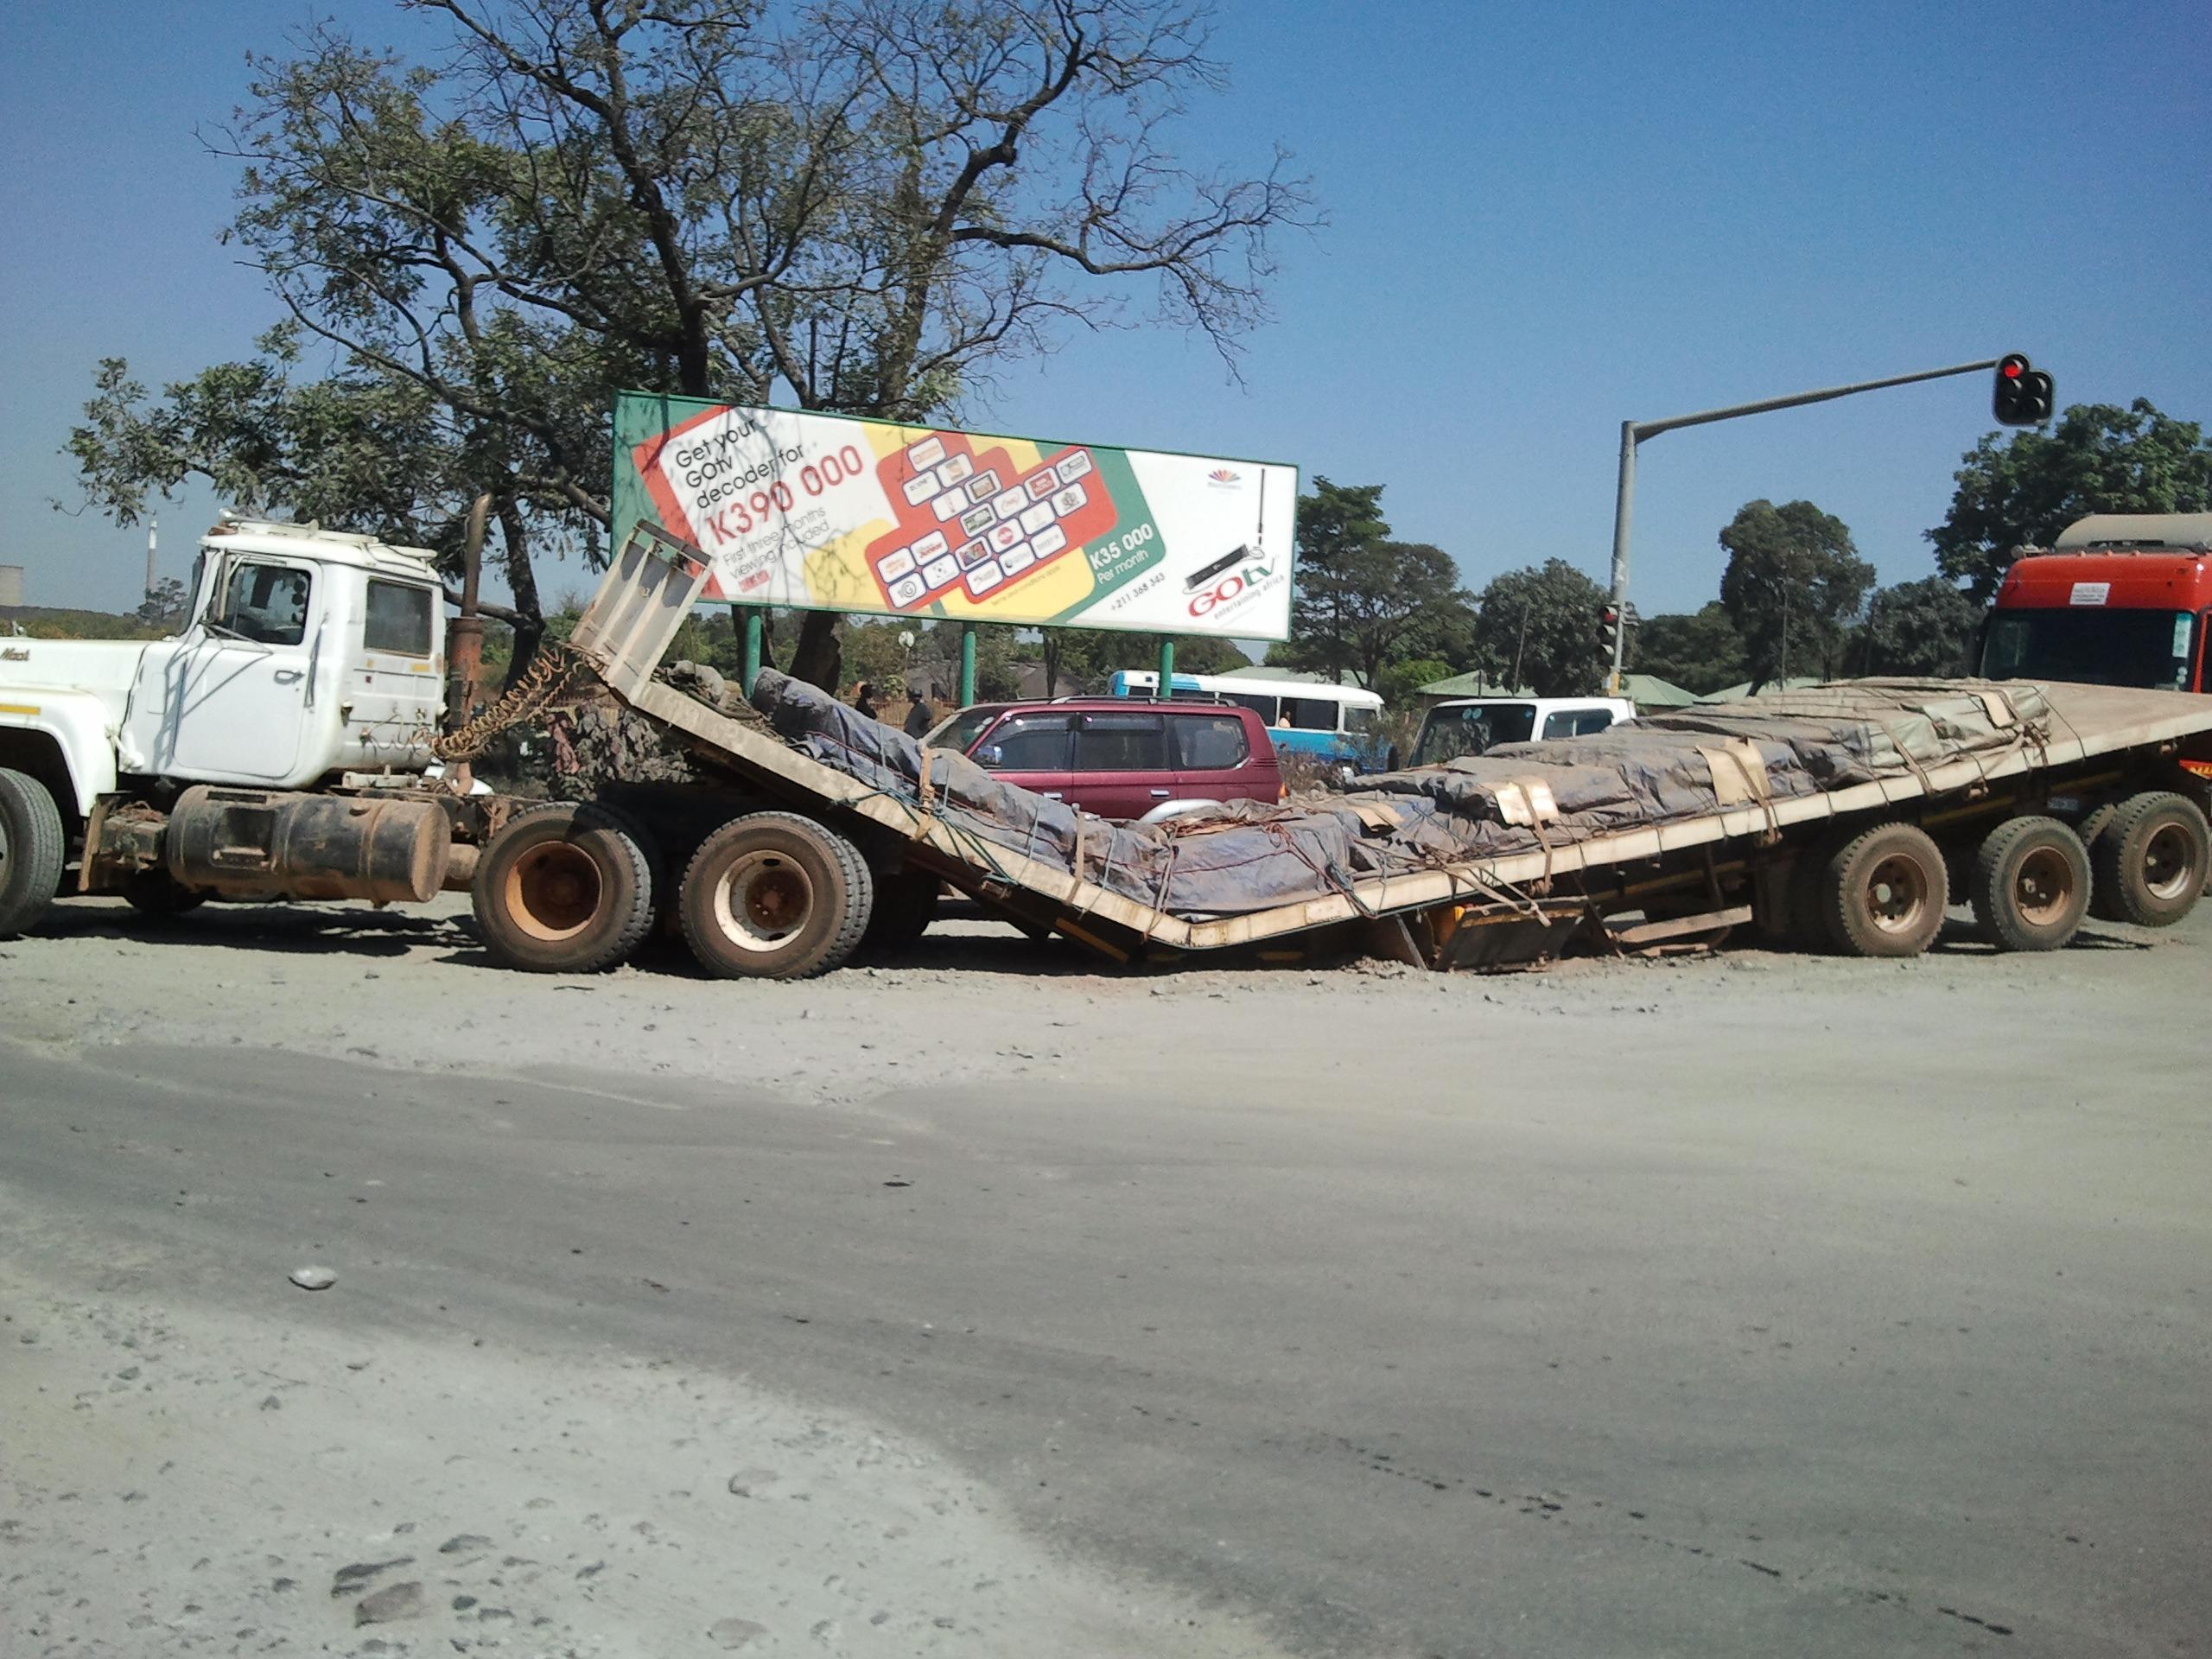 Free Images : asphalt, transport, truck, vehicle, broken, weight ...